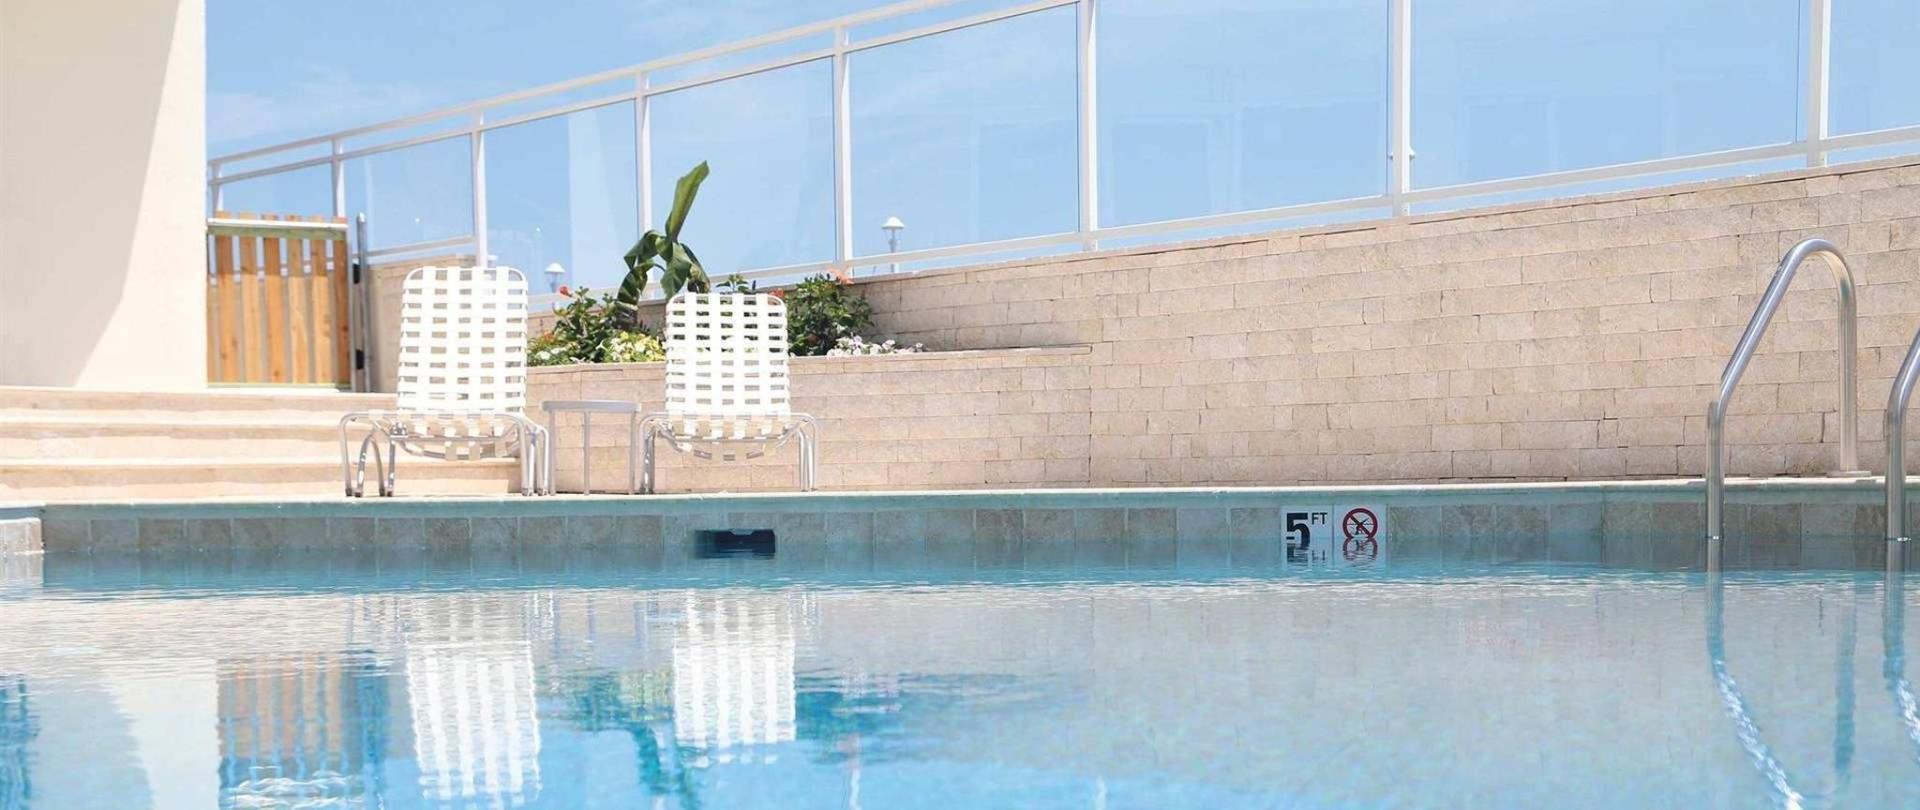 sb-pool2600-2.jpg.1920x810_0_14_10000.jpeg.1920x0.jpeg